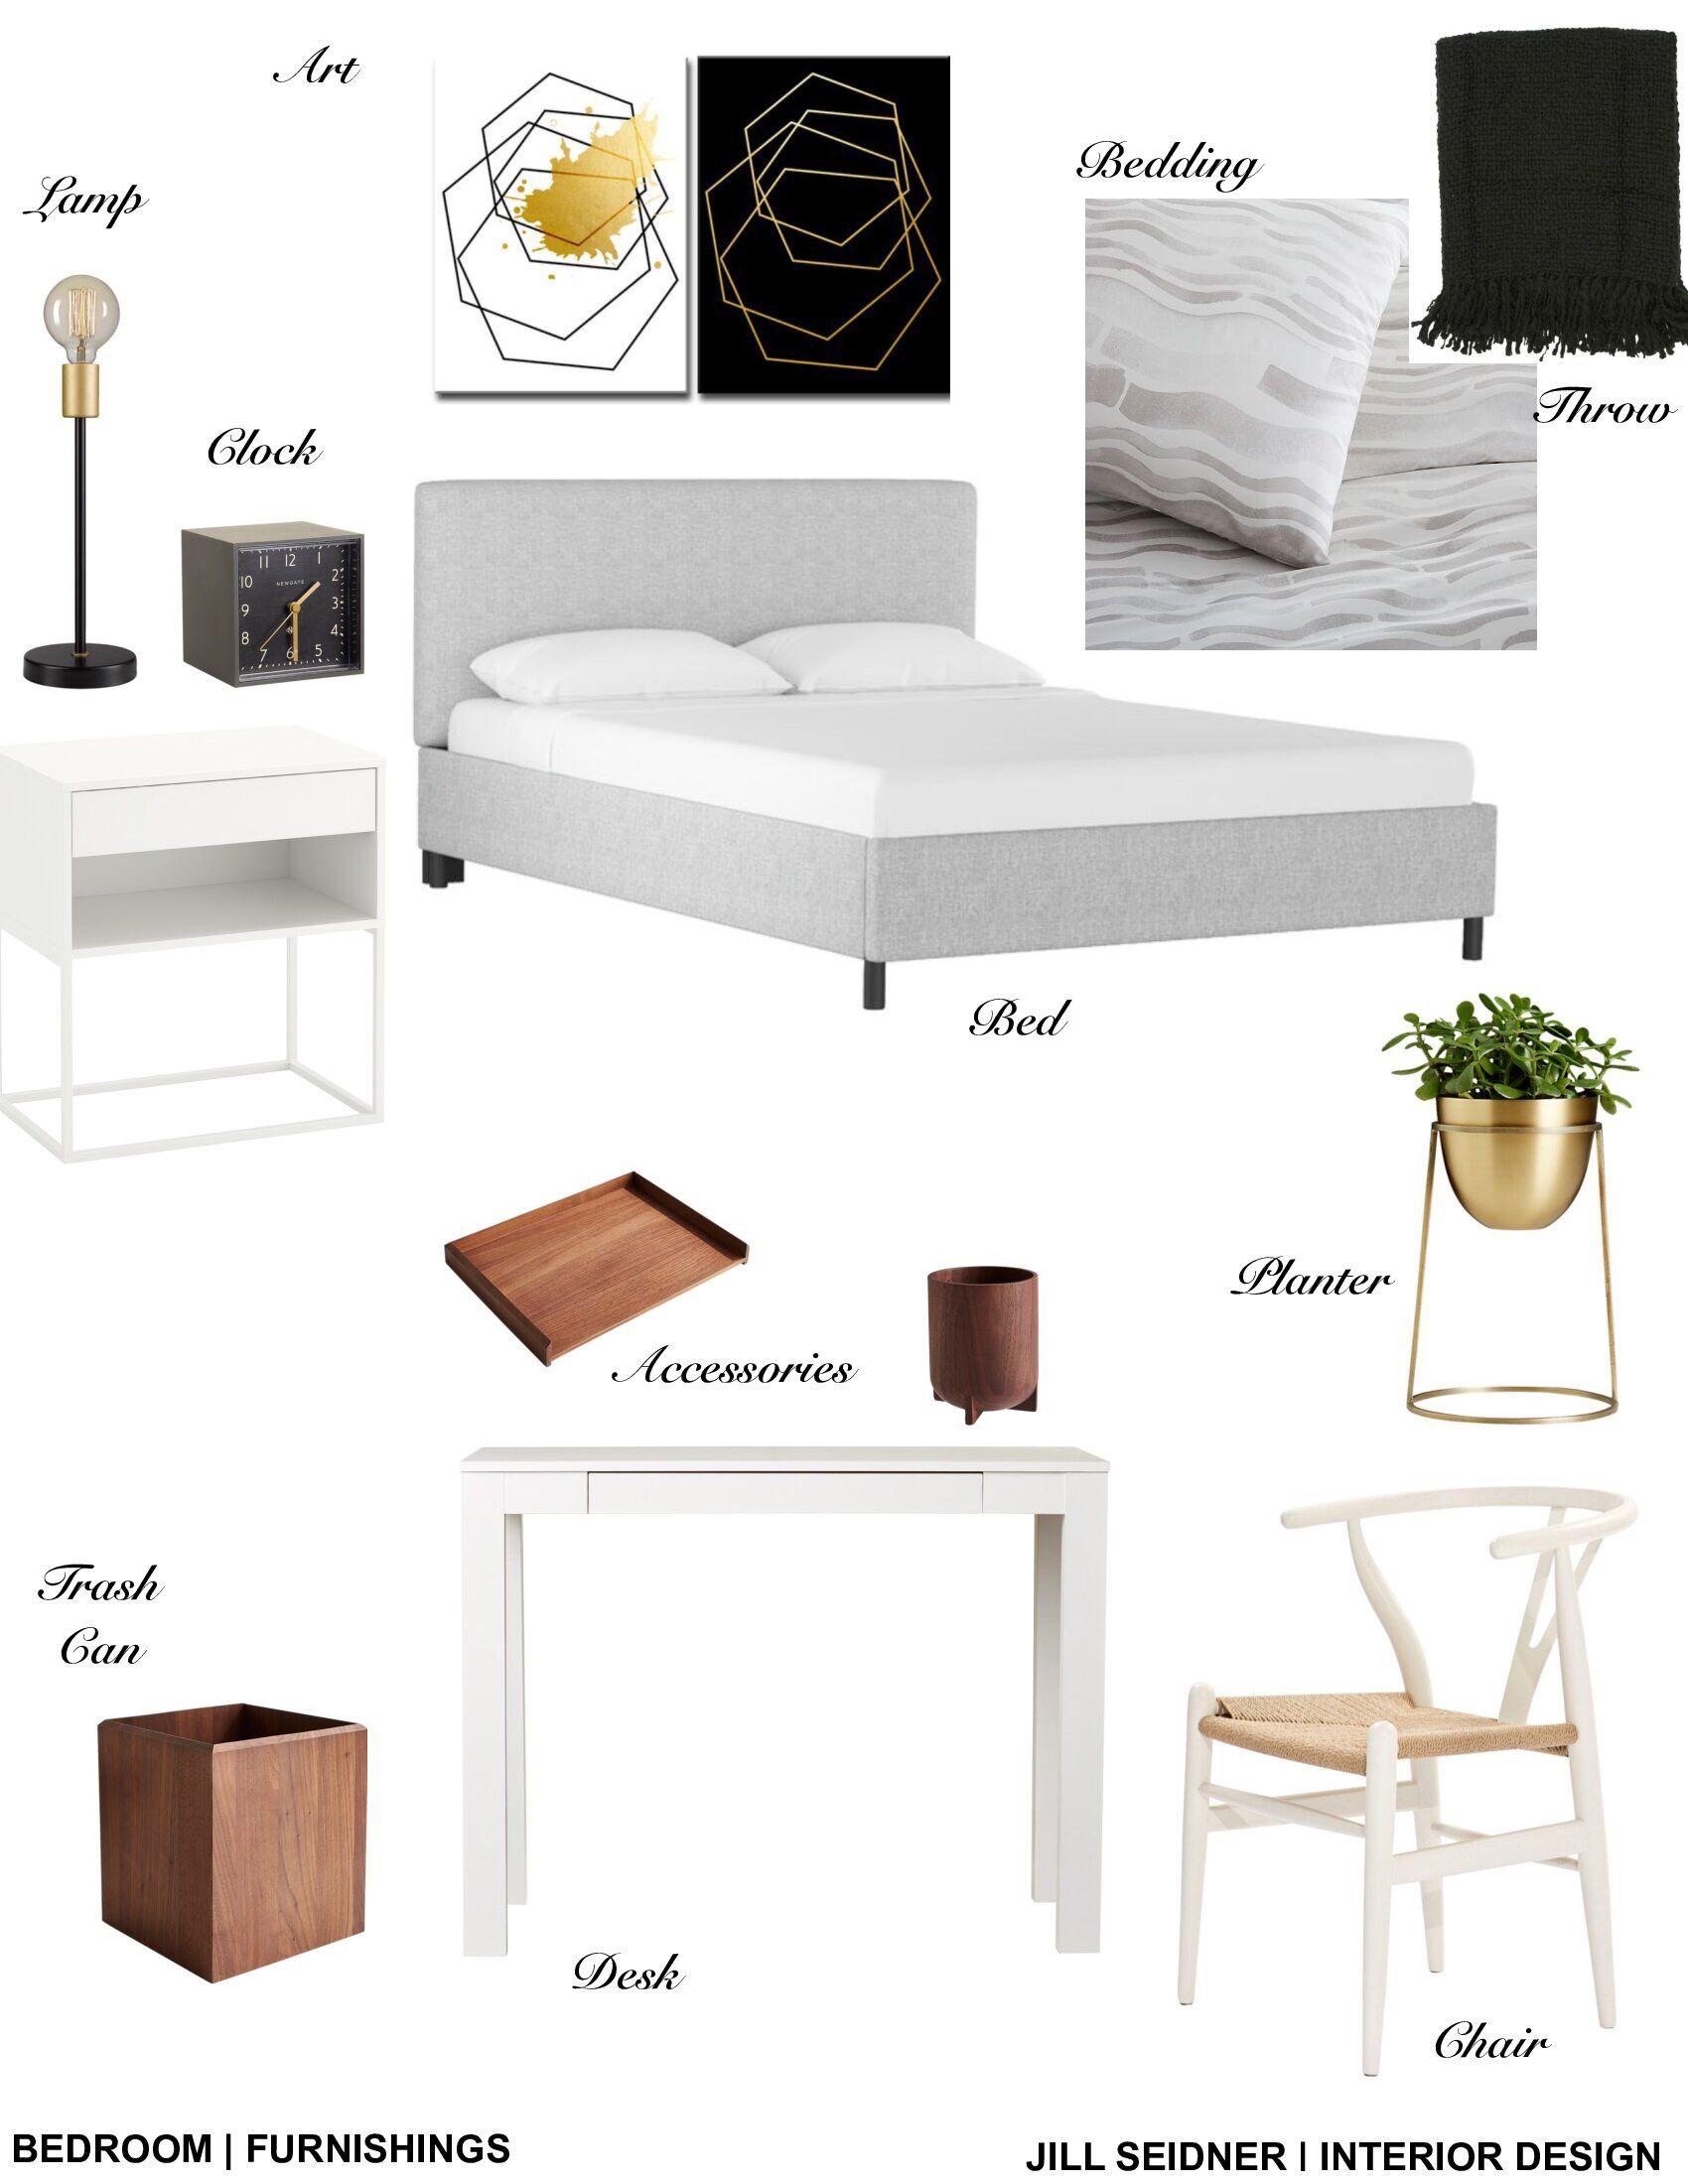 Bedroom Creator Online: Downtown LA Apartment Bedroom 1 Furnishings Concept Board